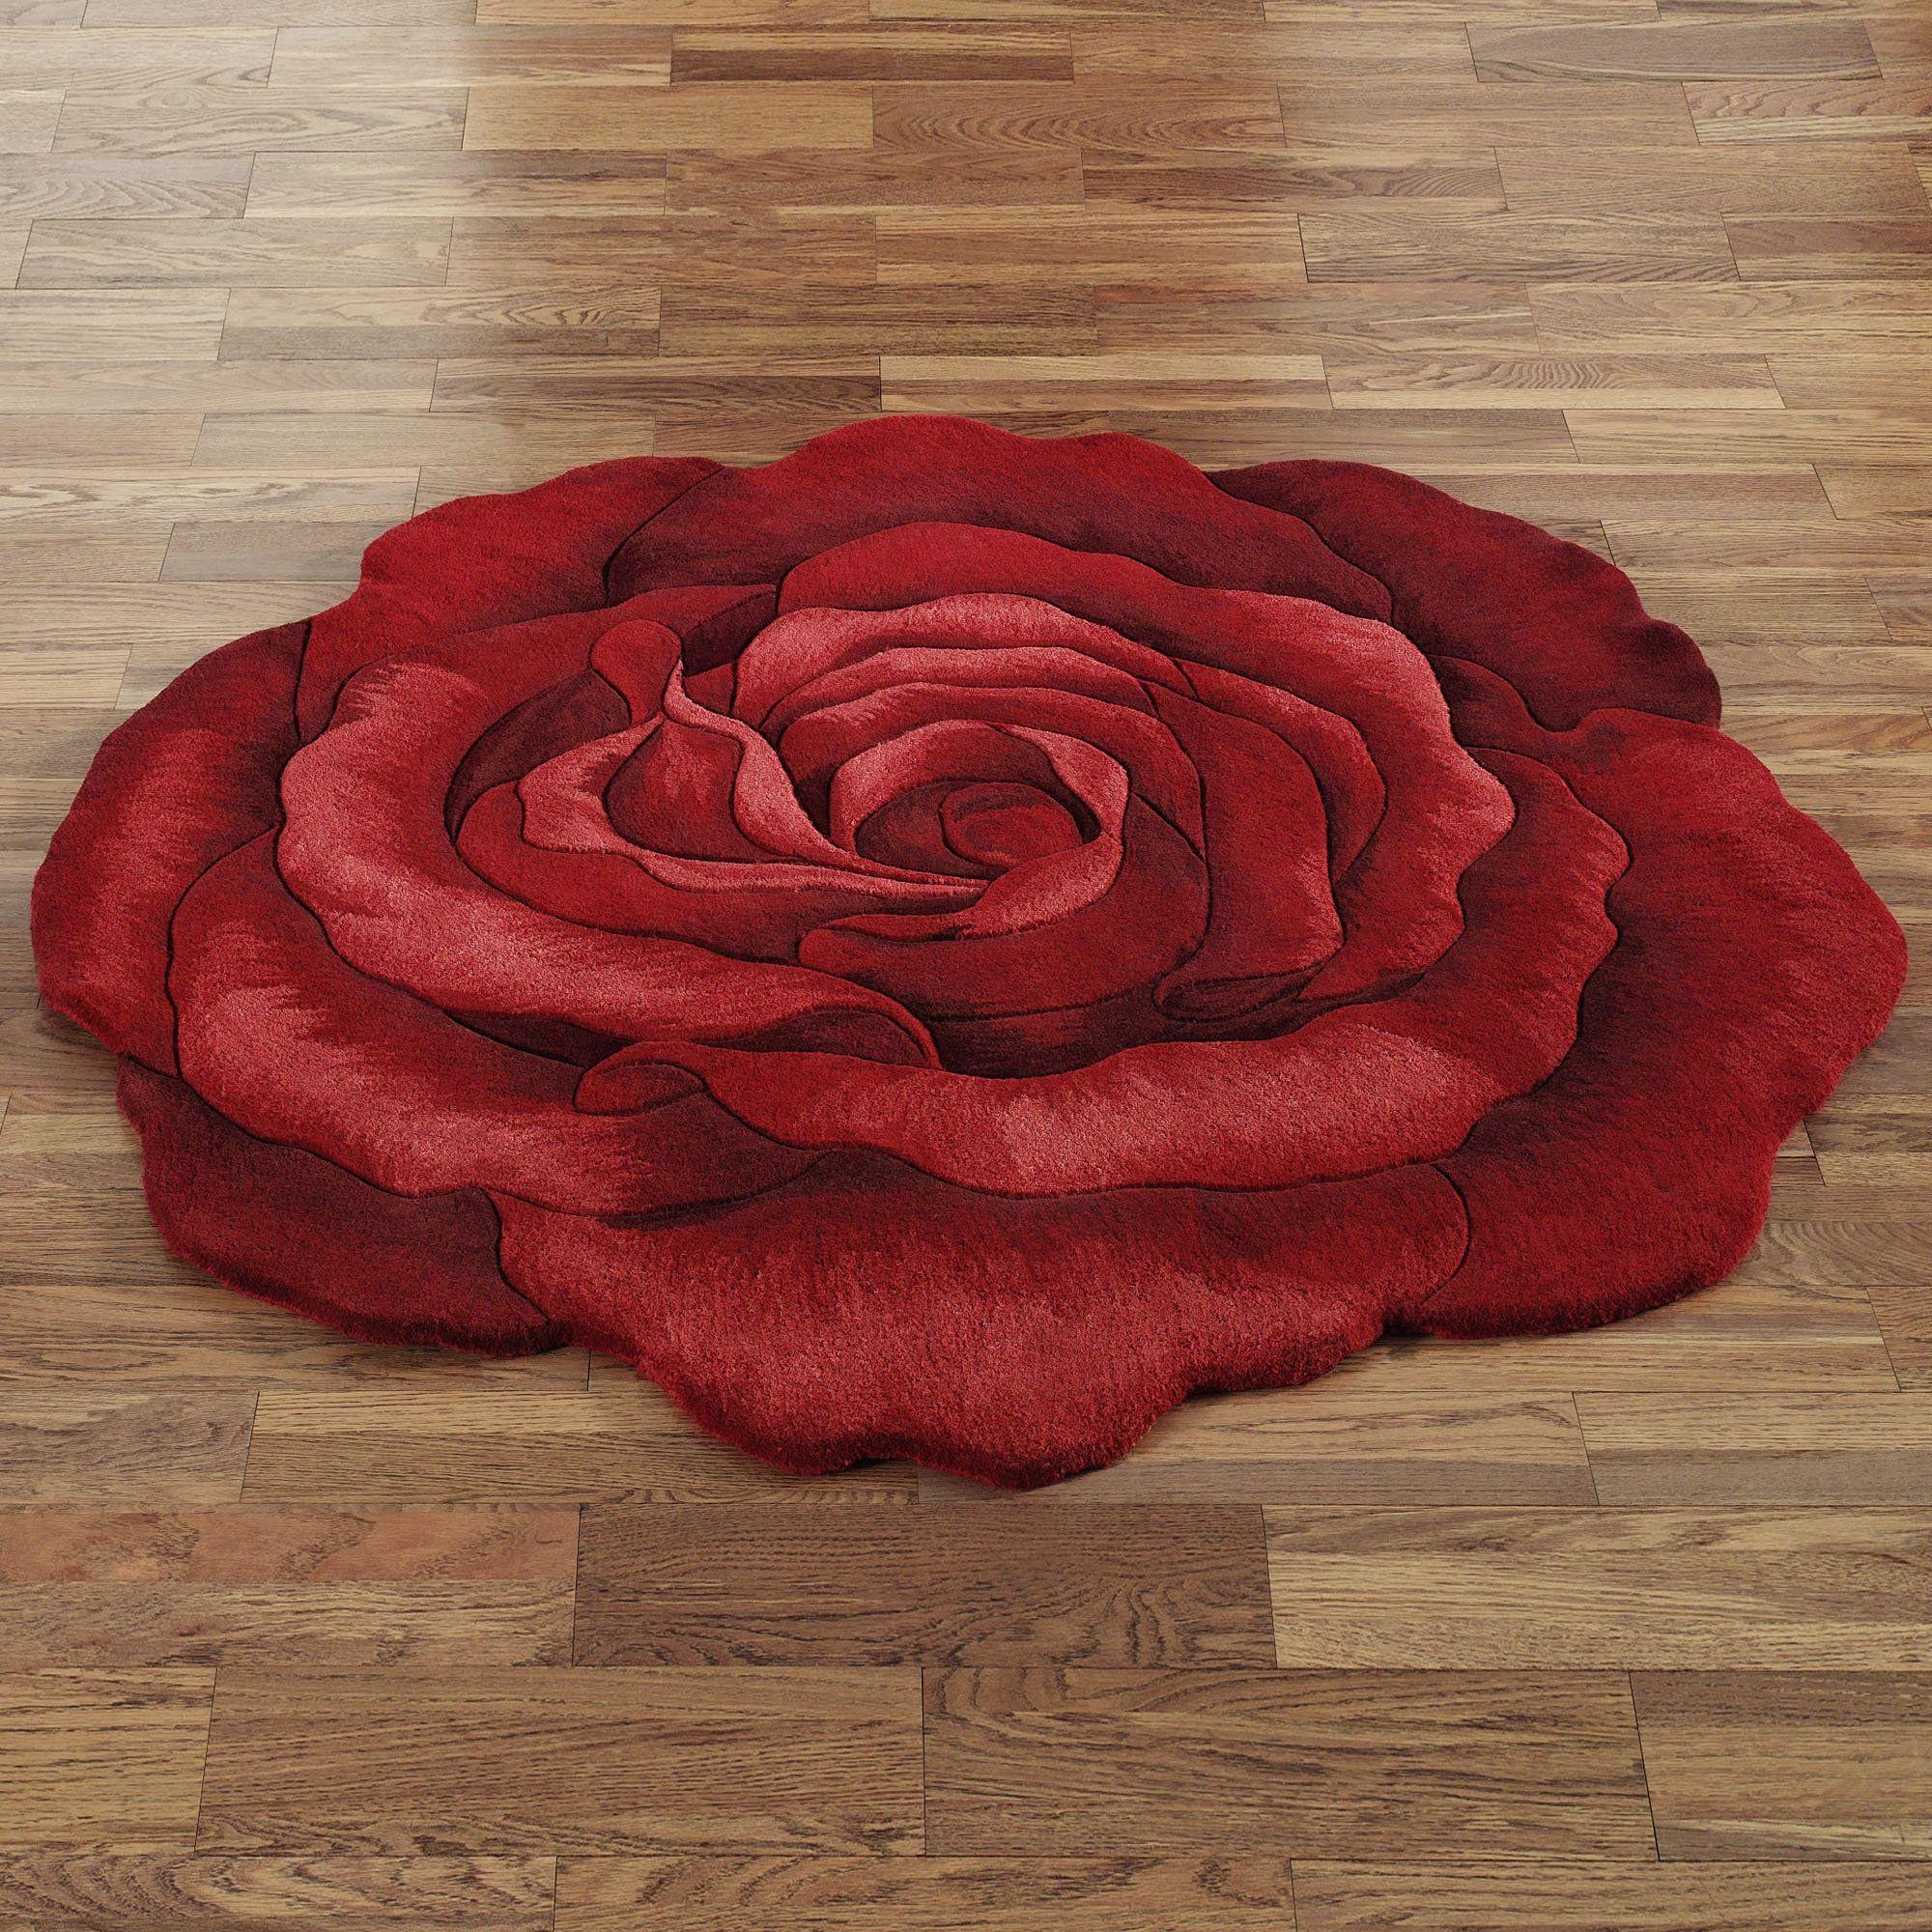 Red Rose Bath Rugs Is True Beauty Of